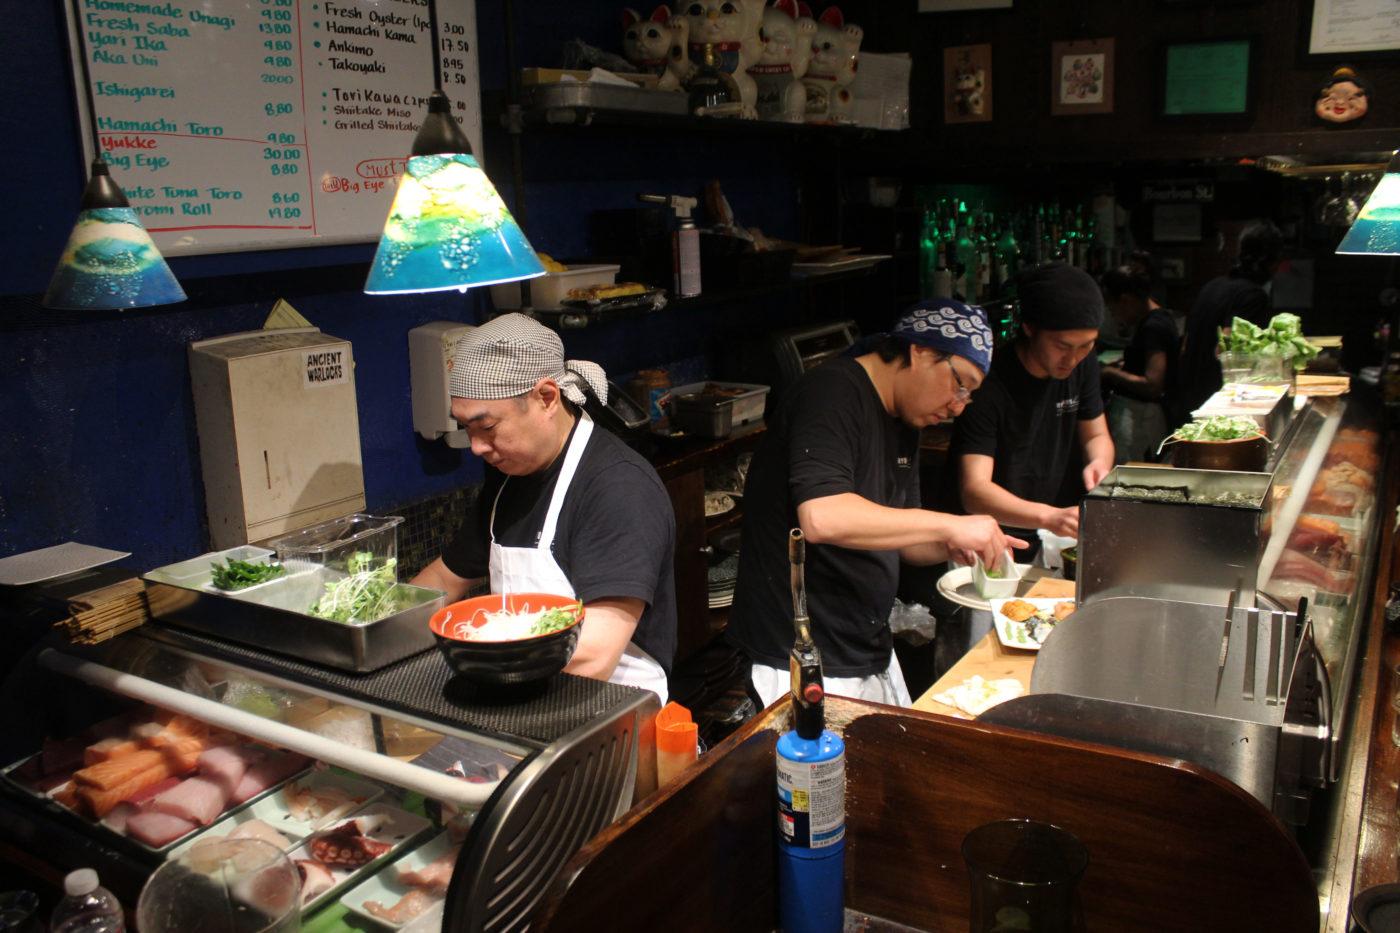 San Francisco Ryoko's Sushi Bar